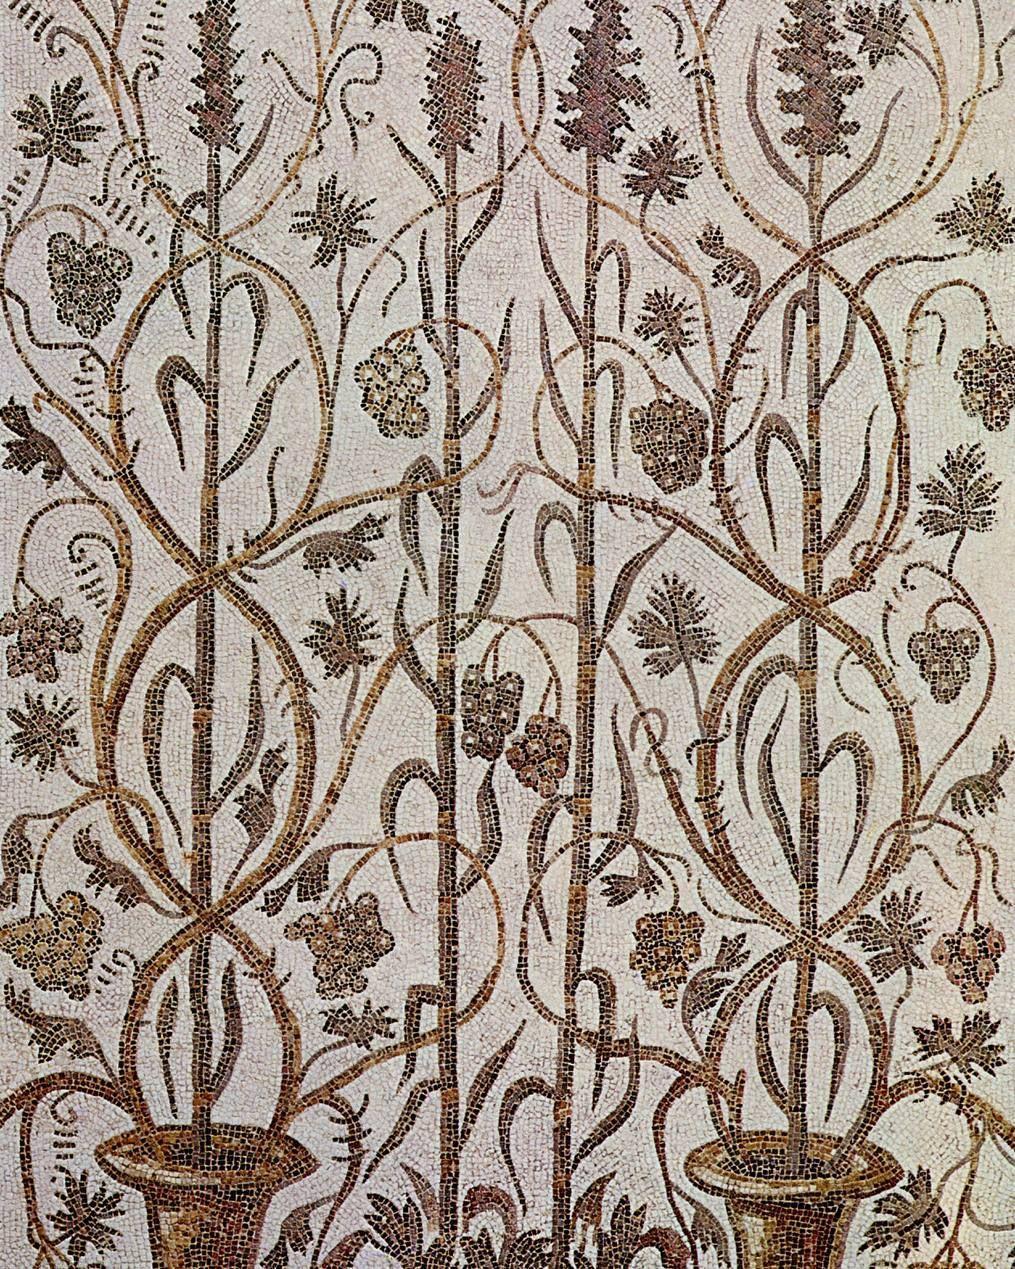 Roman mosaic of Tunisia Bardo Museum - 3rd century AD Oudna - interwined floral motifs